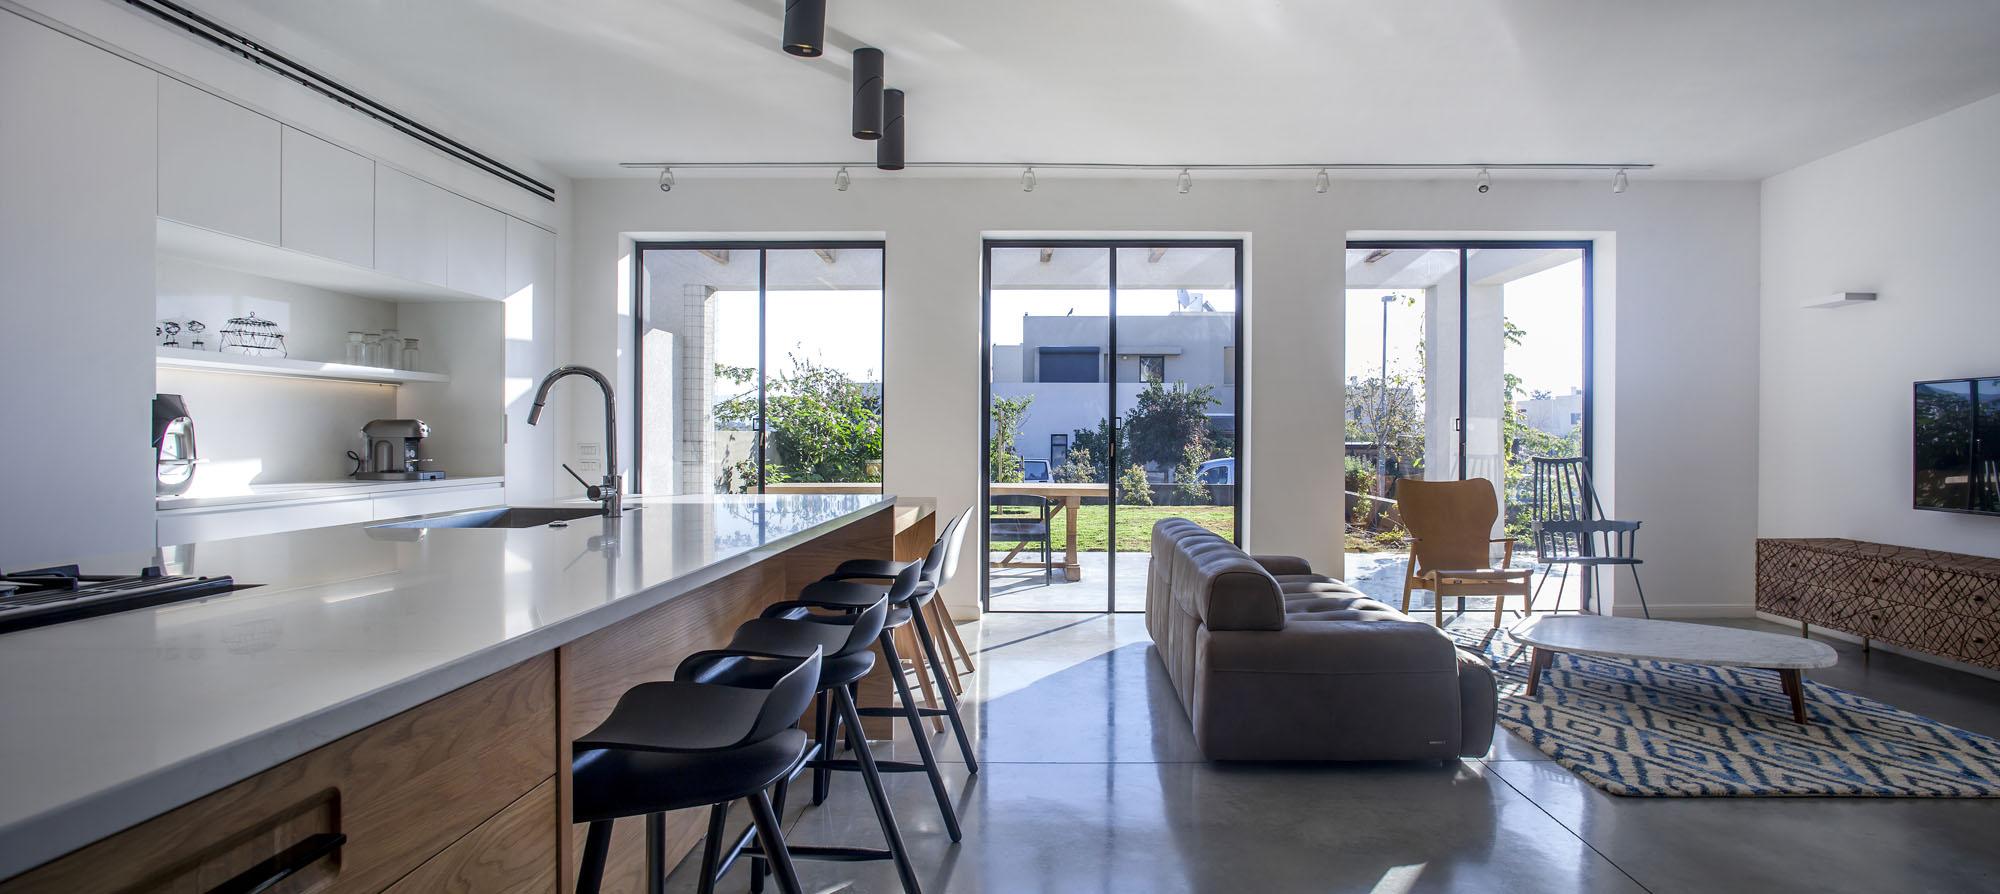 Kibbutz Residence by Henkin Shavit Architecture & Design-04